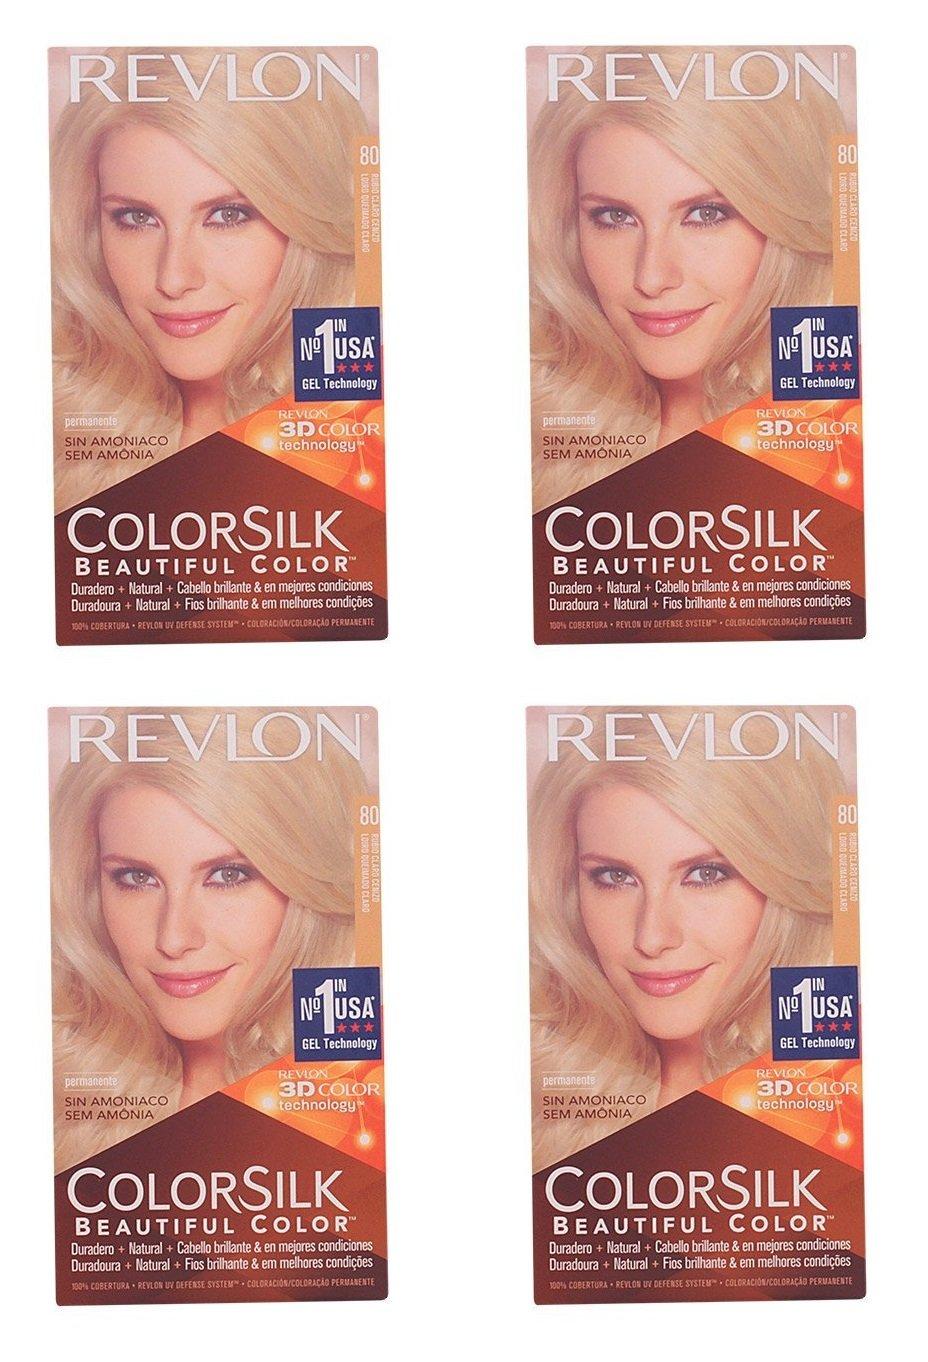 Revlon Colorsilk Beautiful Color, Medium Golden Chestnut Brown 46 1 ea (Pack of 4) + FREE Curad Dazzle Bandages 25 Ct